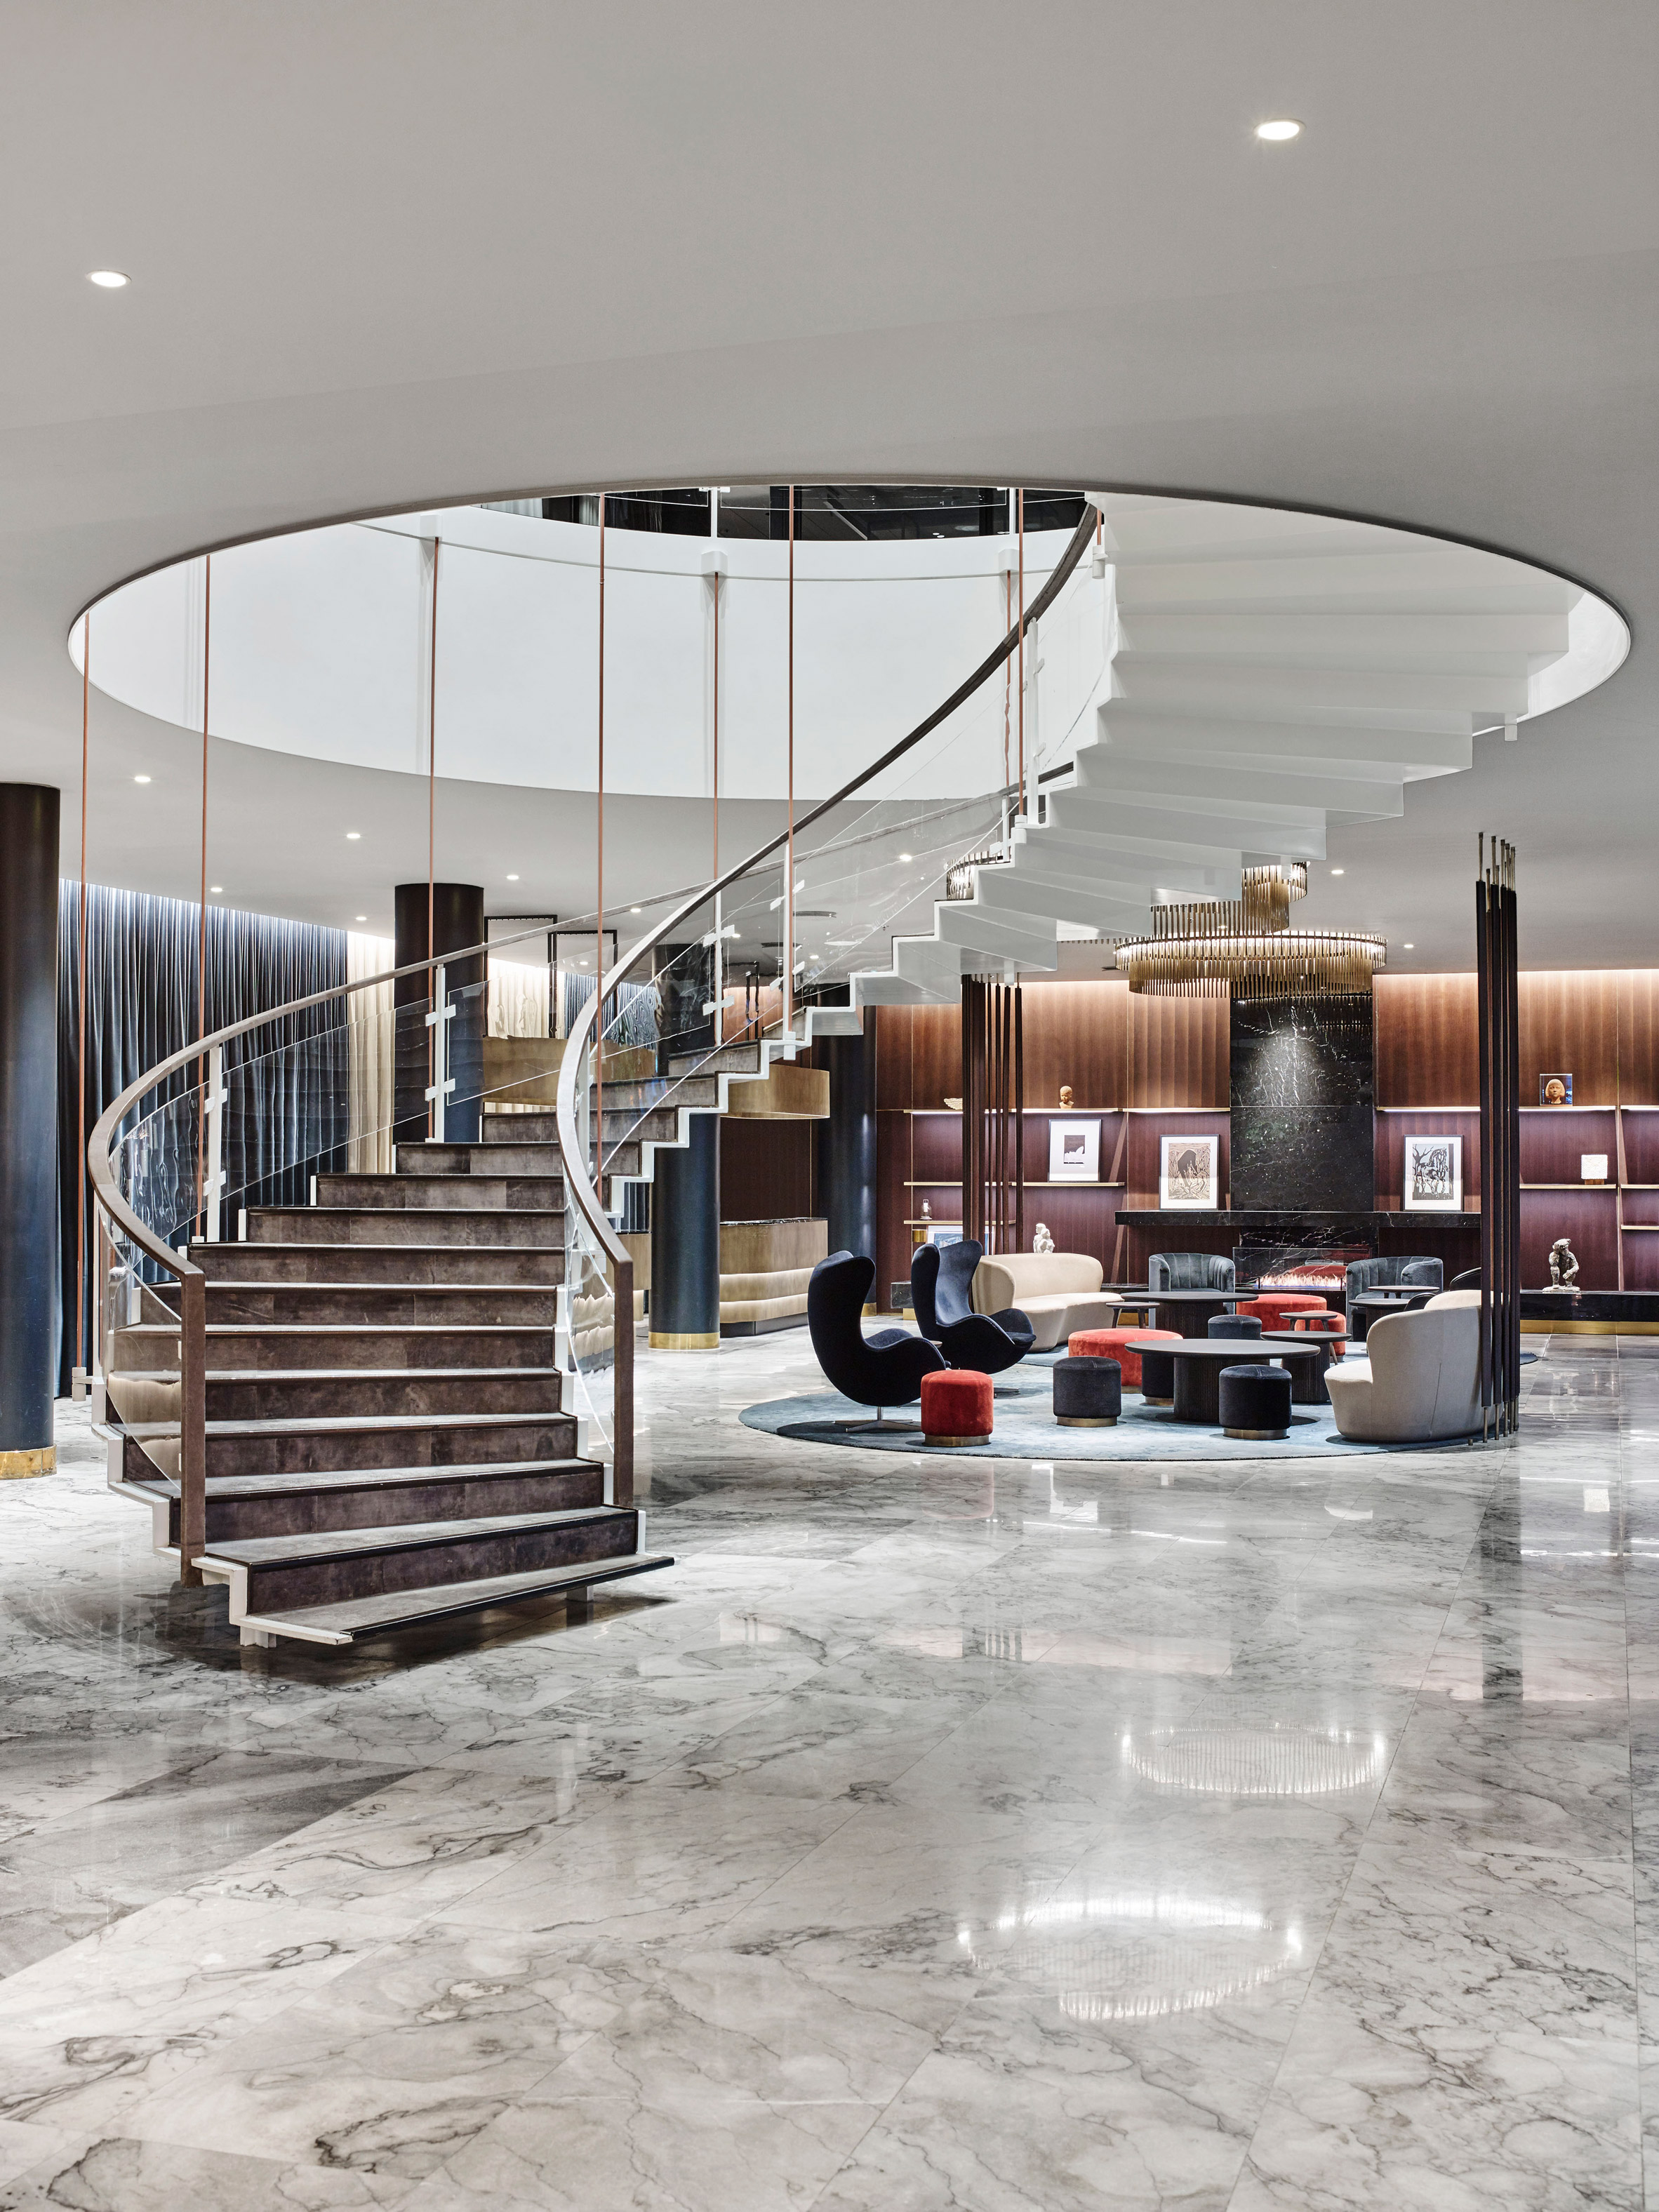 Radisson Blu Royal Hotel by Space Copenhagen